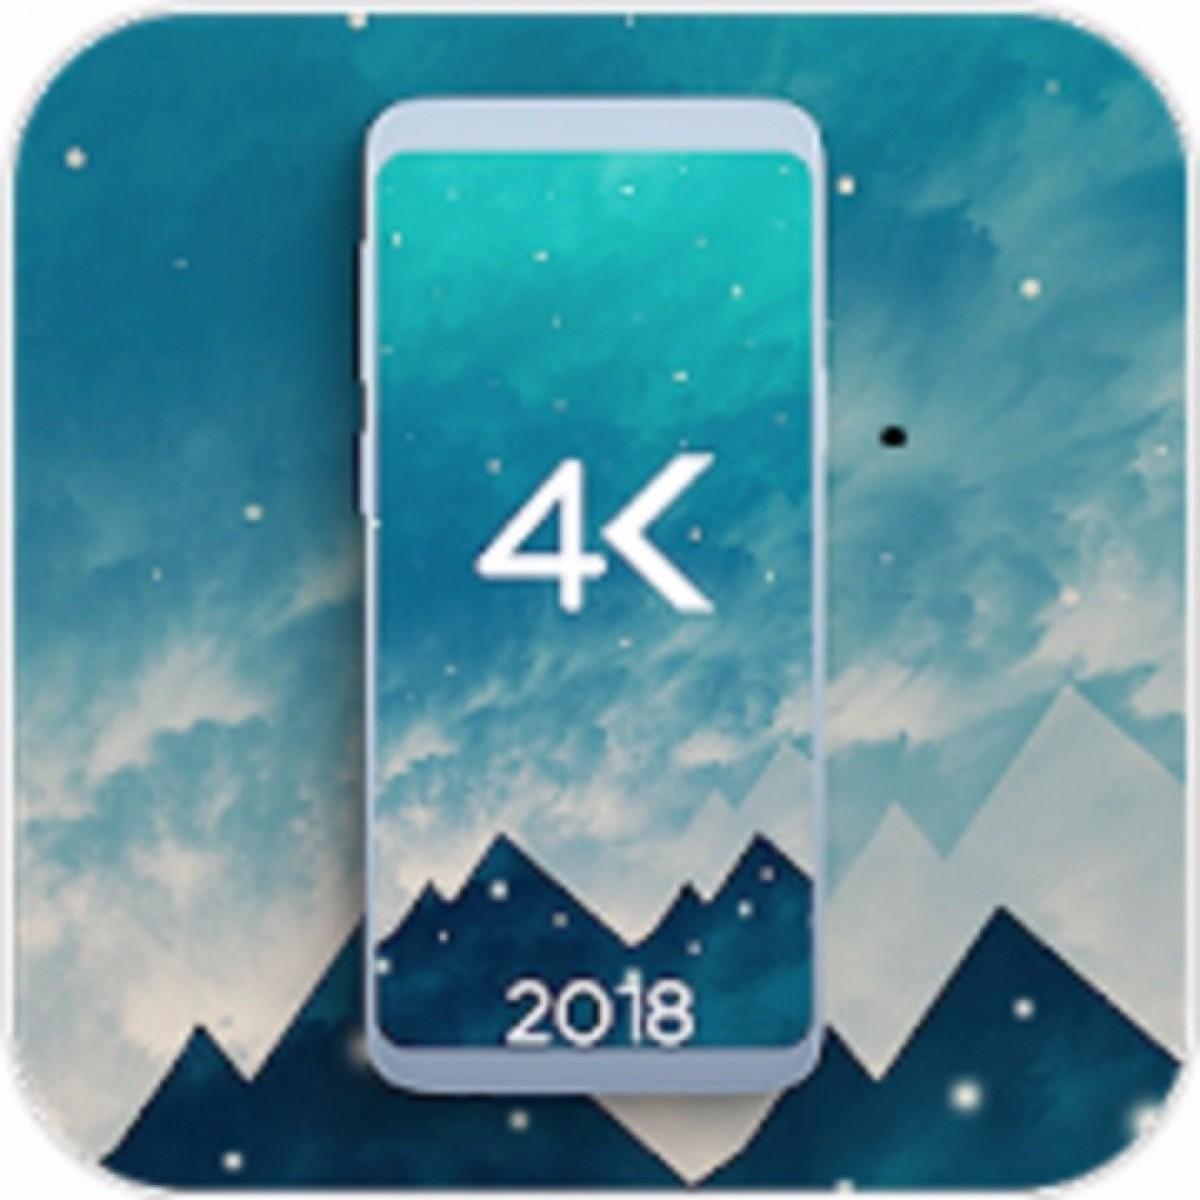 4K Wallpapers Ultra HD Backgrounds Apk  v2.6.2.2 Download